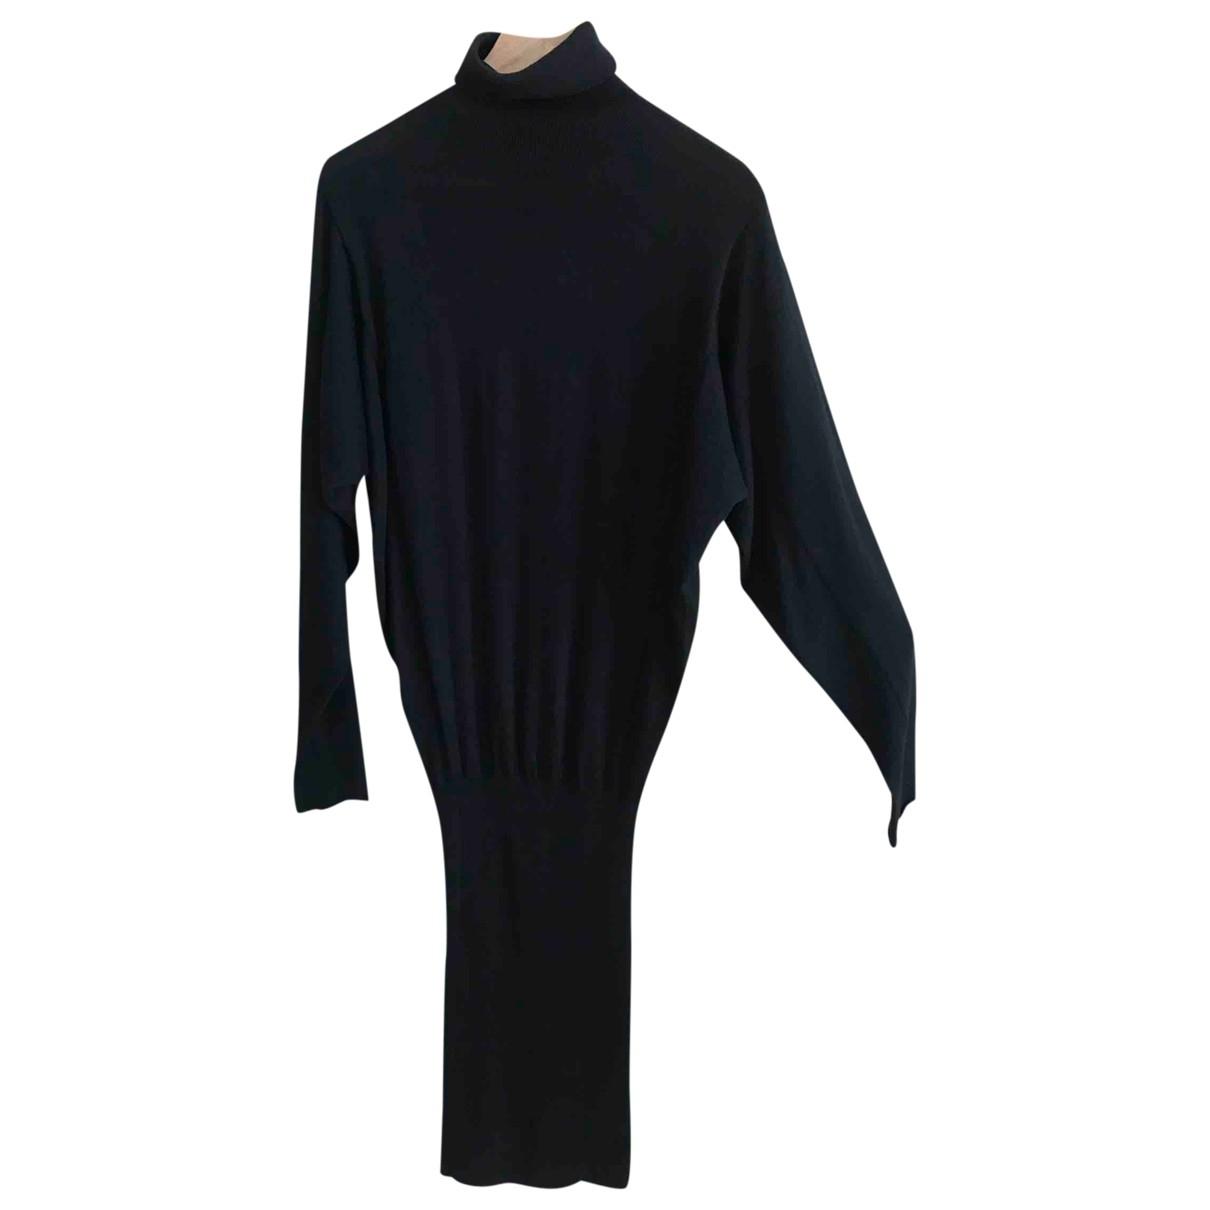 Acne Studios \N Black Wool dress for Women XS International